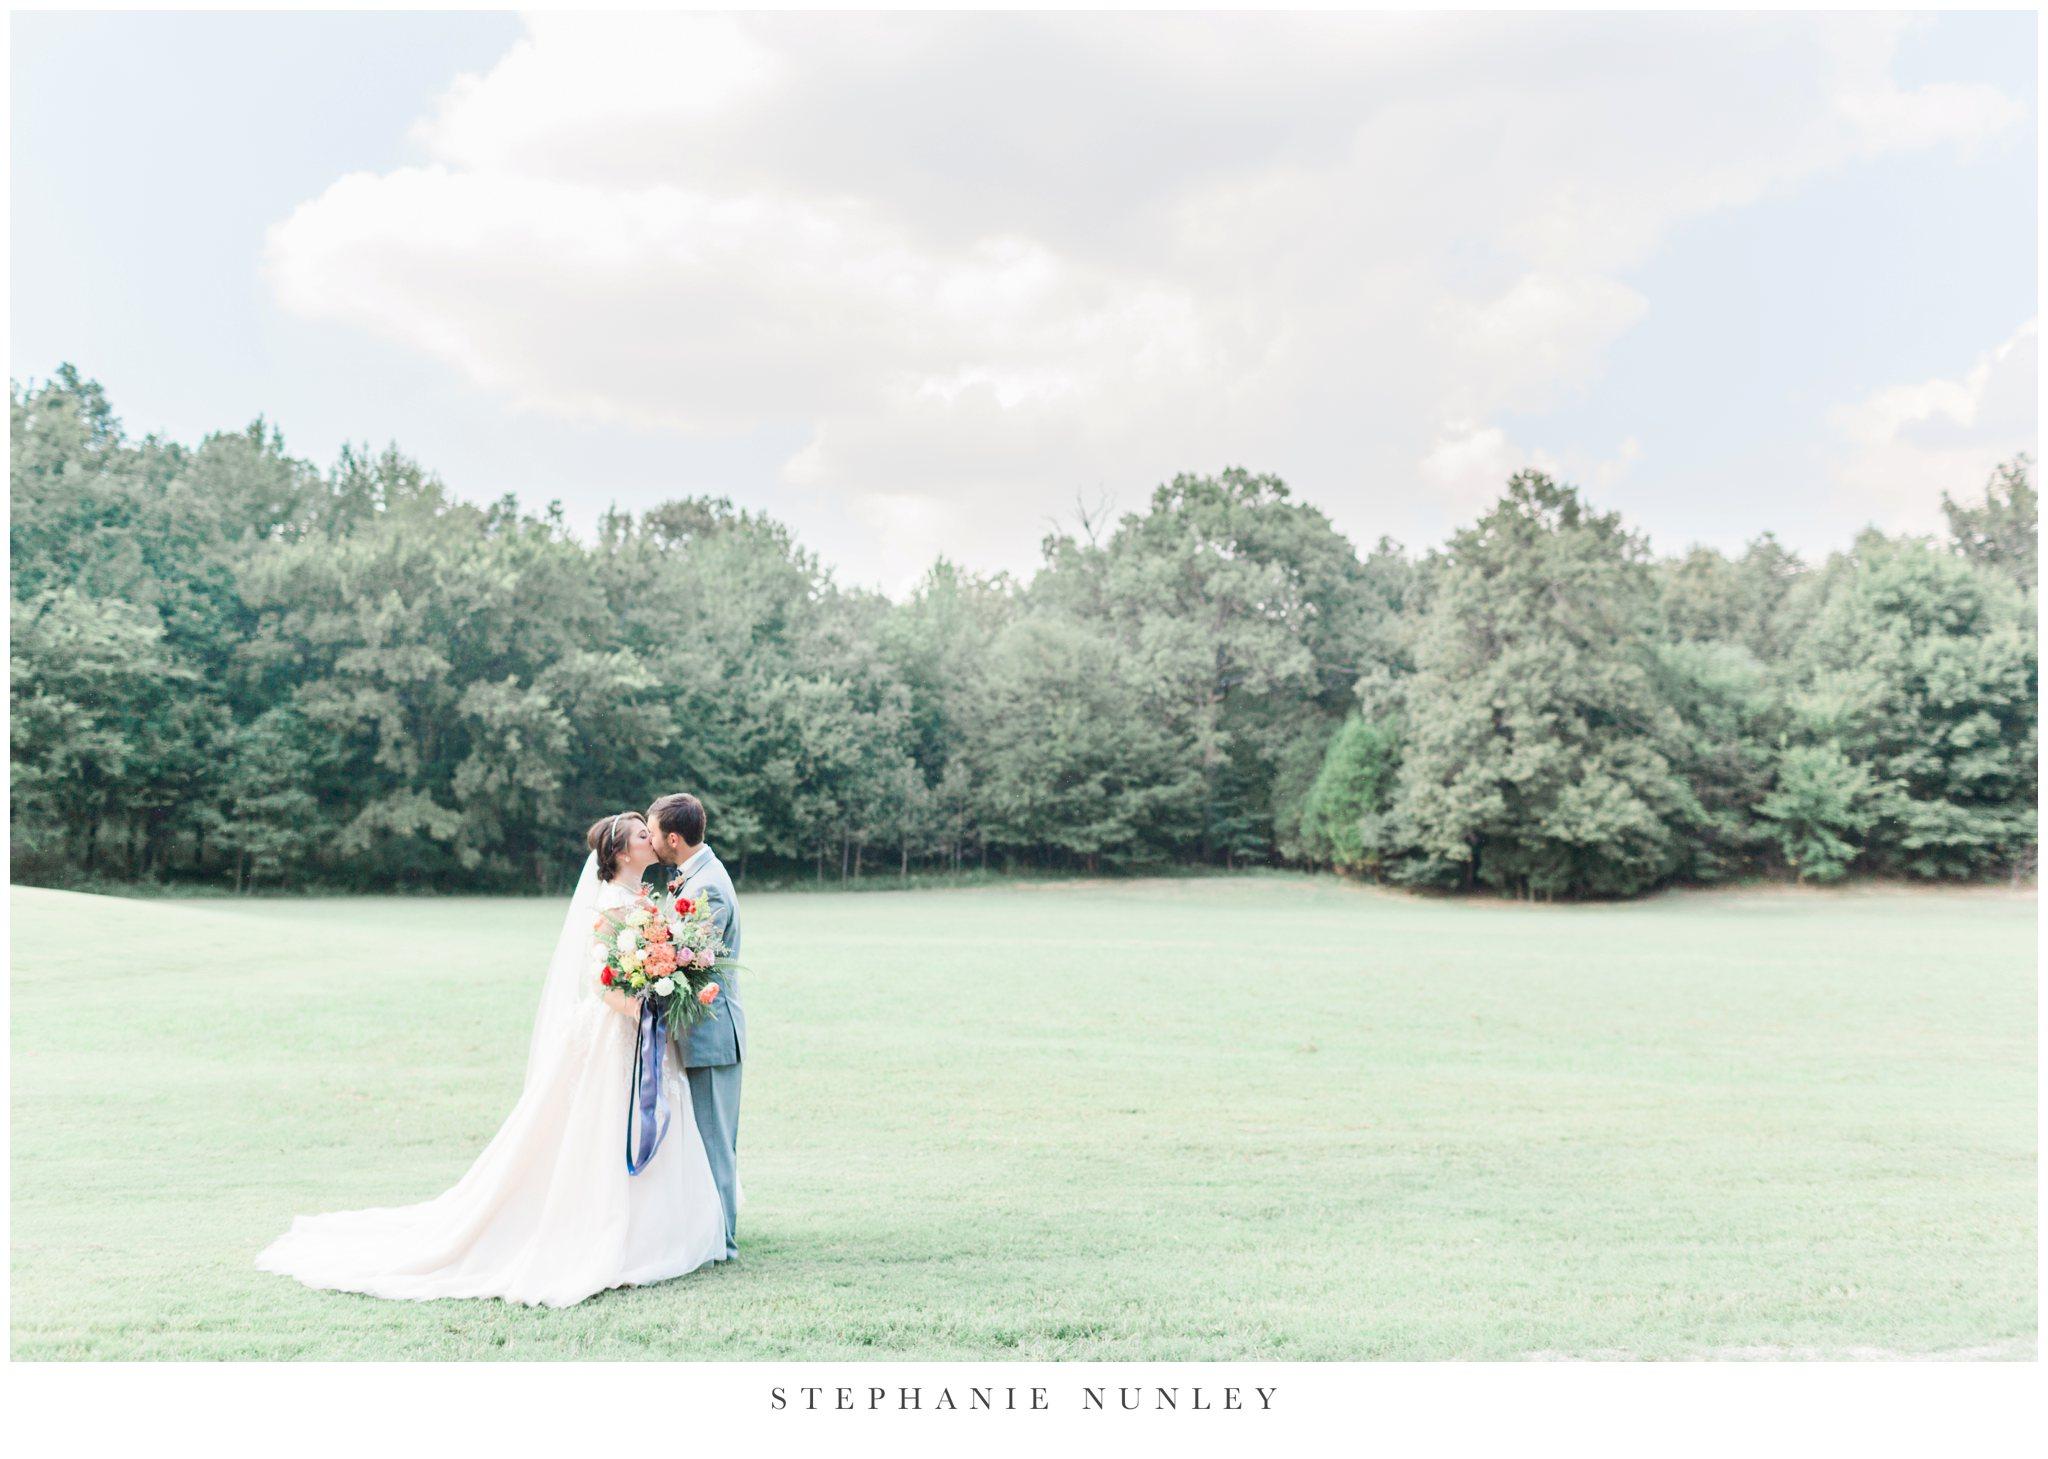 arkansas-wedding-with-lush-wildflower-bouquet-0083.jpg